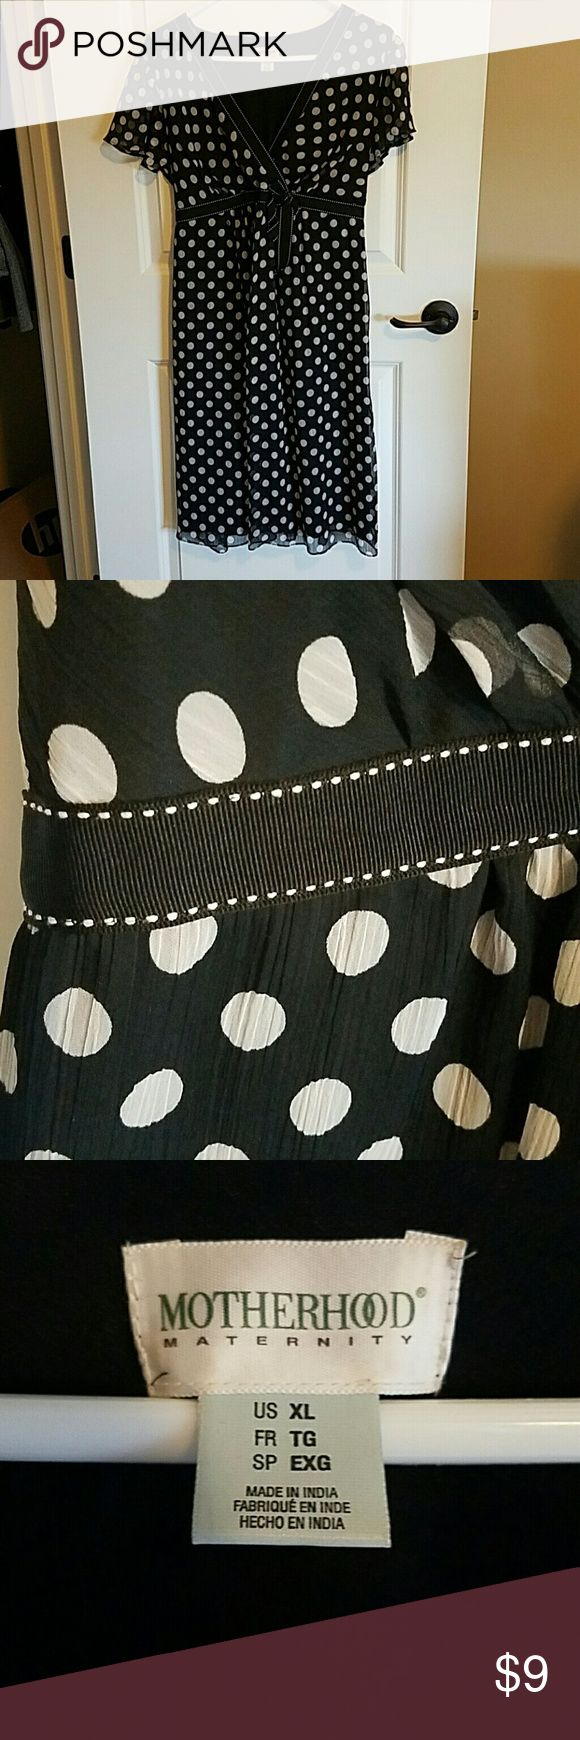 Motherhood maternity xl dress Black and white polka dot xl maternity dress. Great condition. Only had a few chances to wear it. Motherhood Maternity Dresses